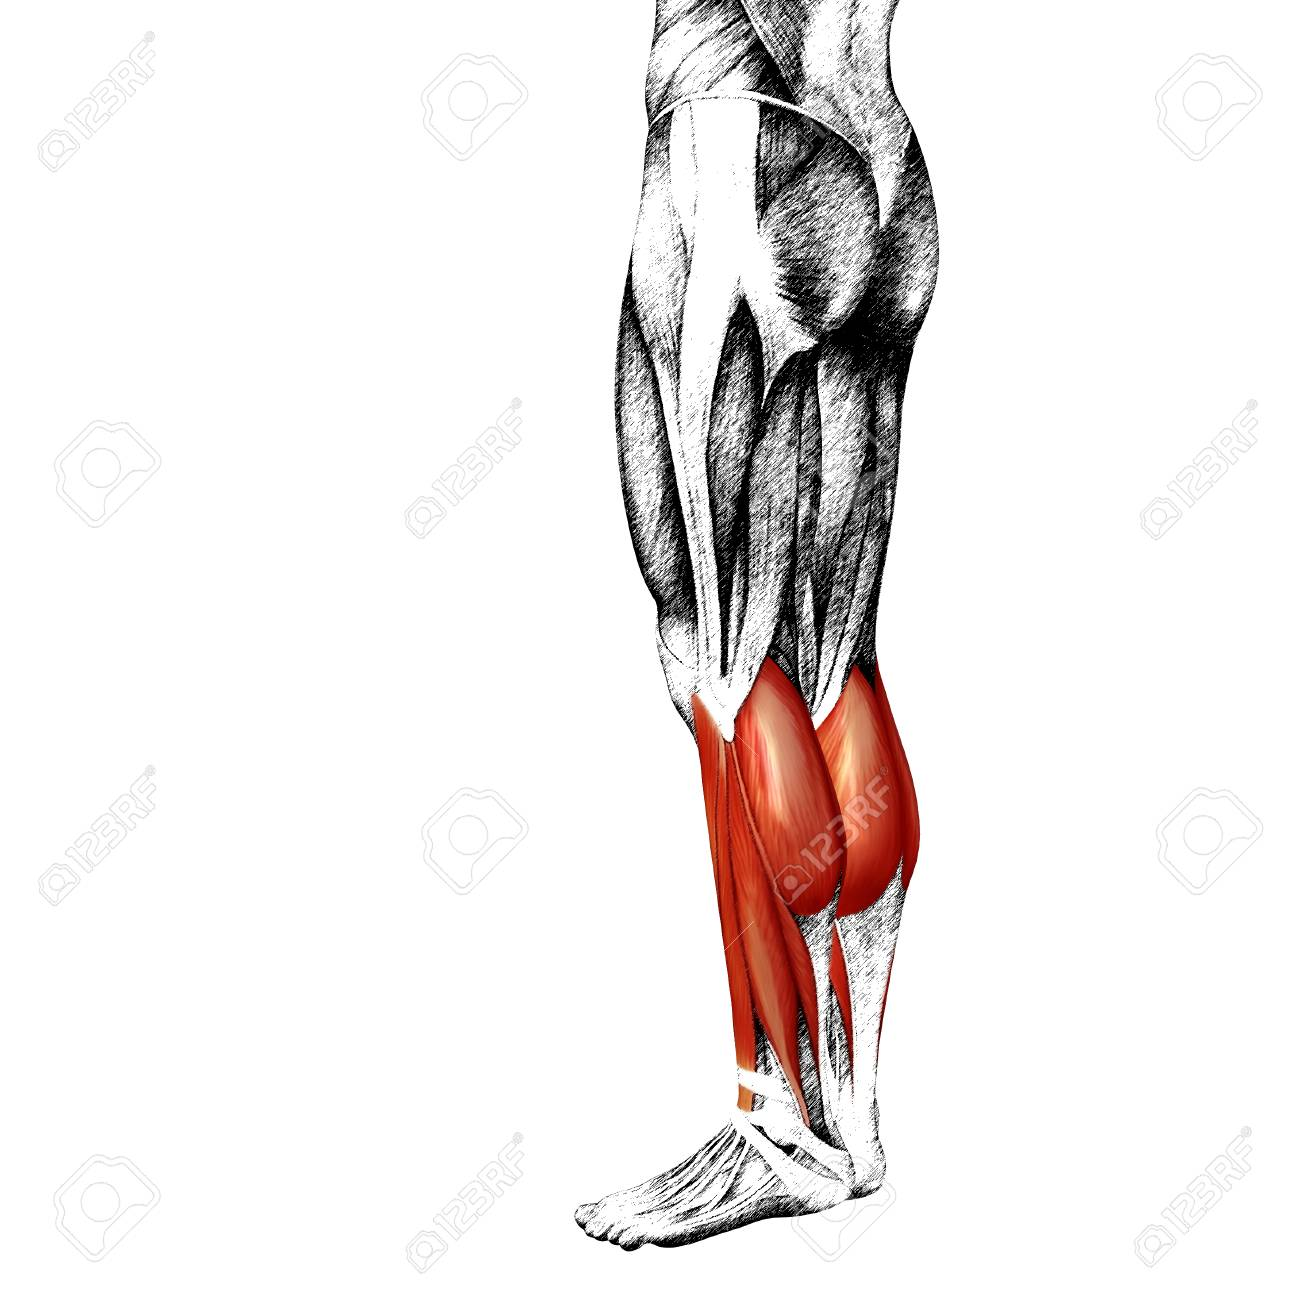 Encantador Pierna Humana Anatomía Muscular Modelo - Imágenes de ...